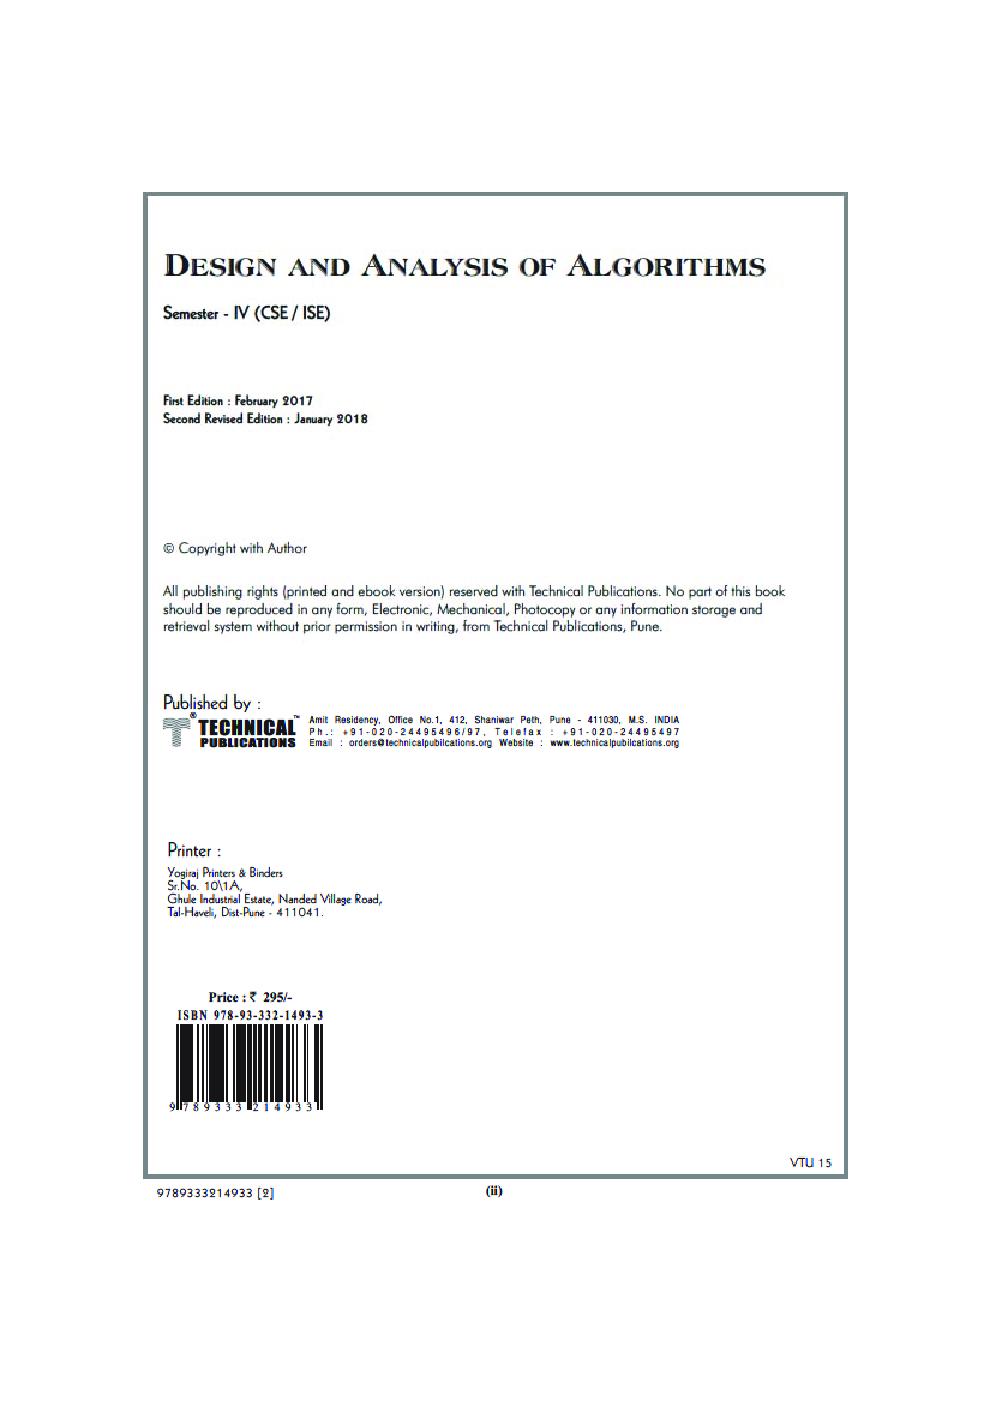 Design And Analysis Of Algorithms For VTU Course 17 CBCS (IV- CSE - 17CS43) - Page 3